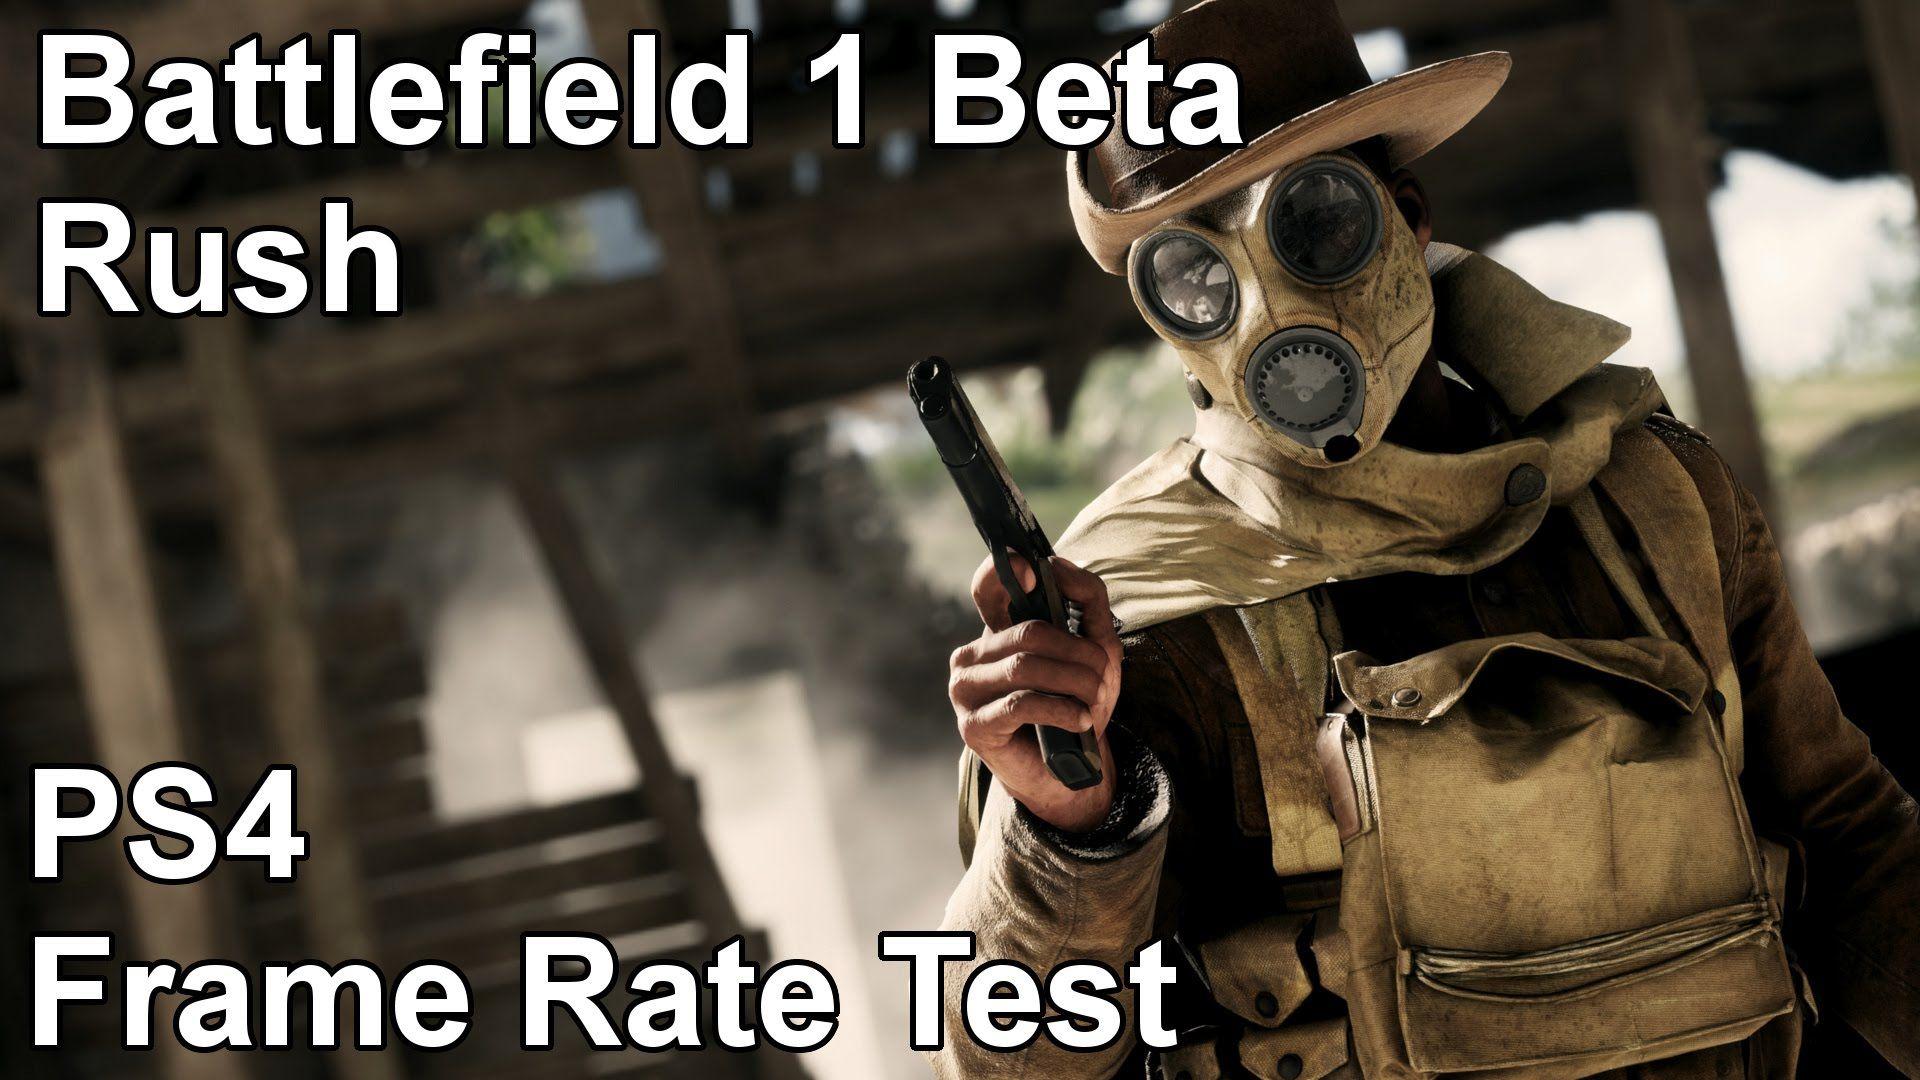 Battlefield 1 Rush Mode PS4 Frame Rate Test (Open Beta